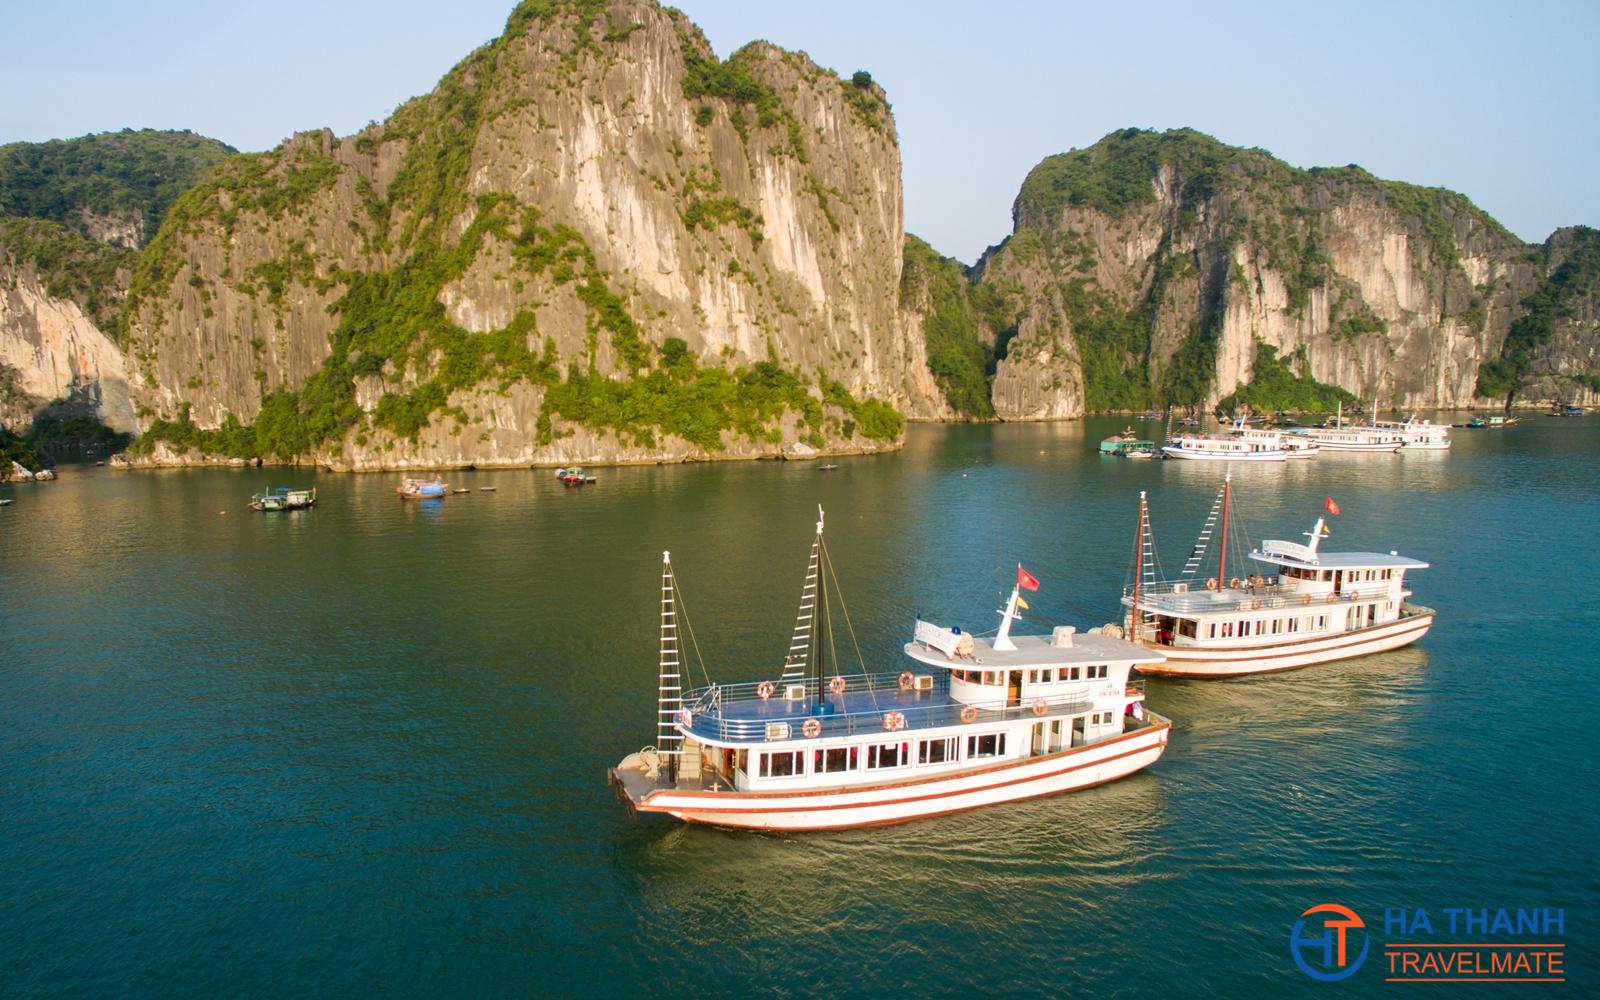 Sen Day Cruise